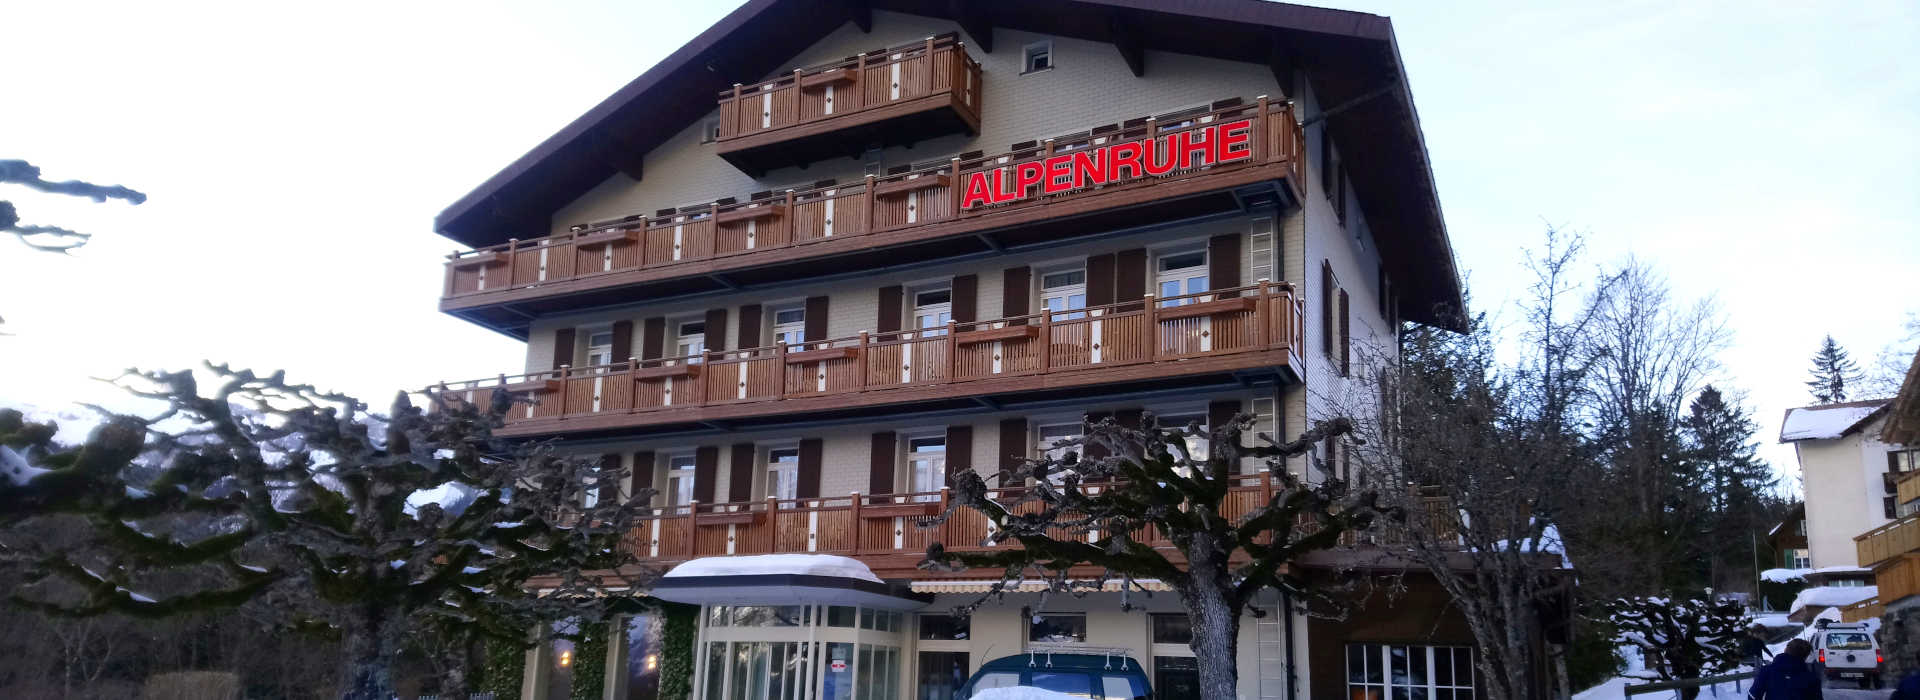 Alpenruhe Hotel